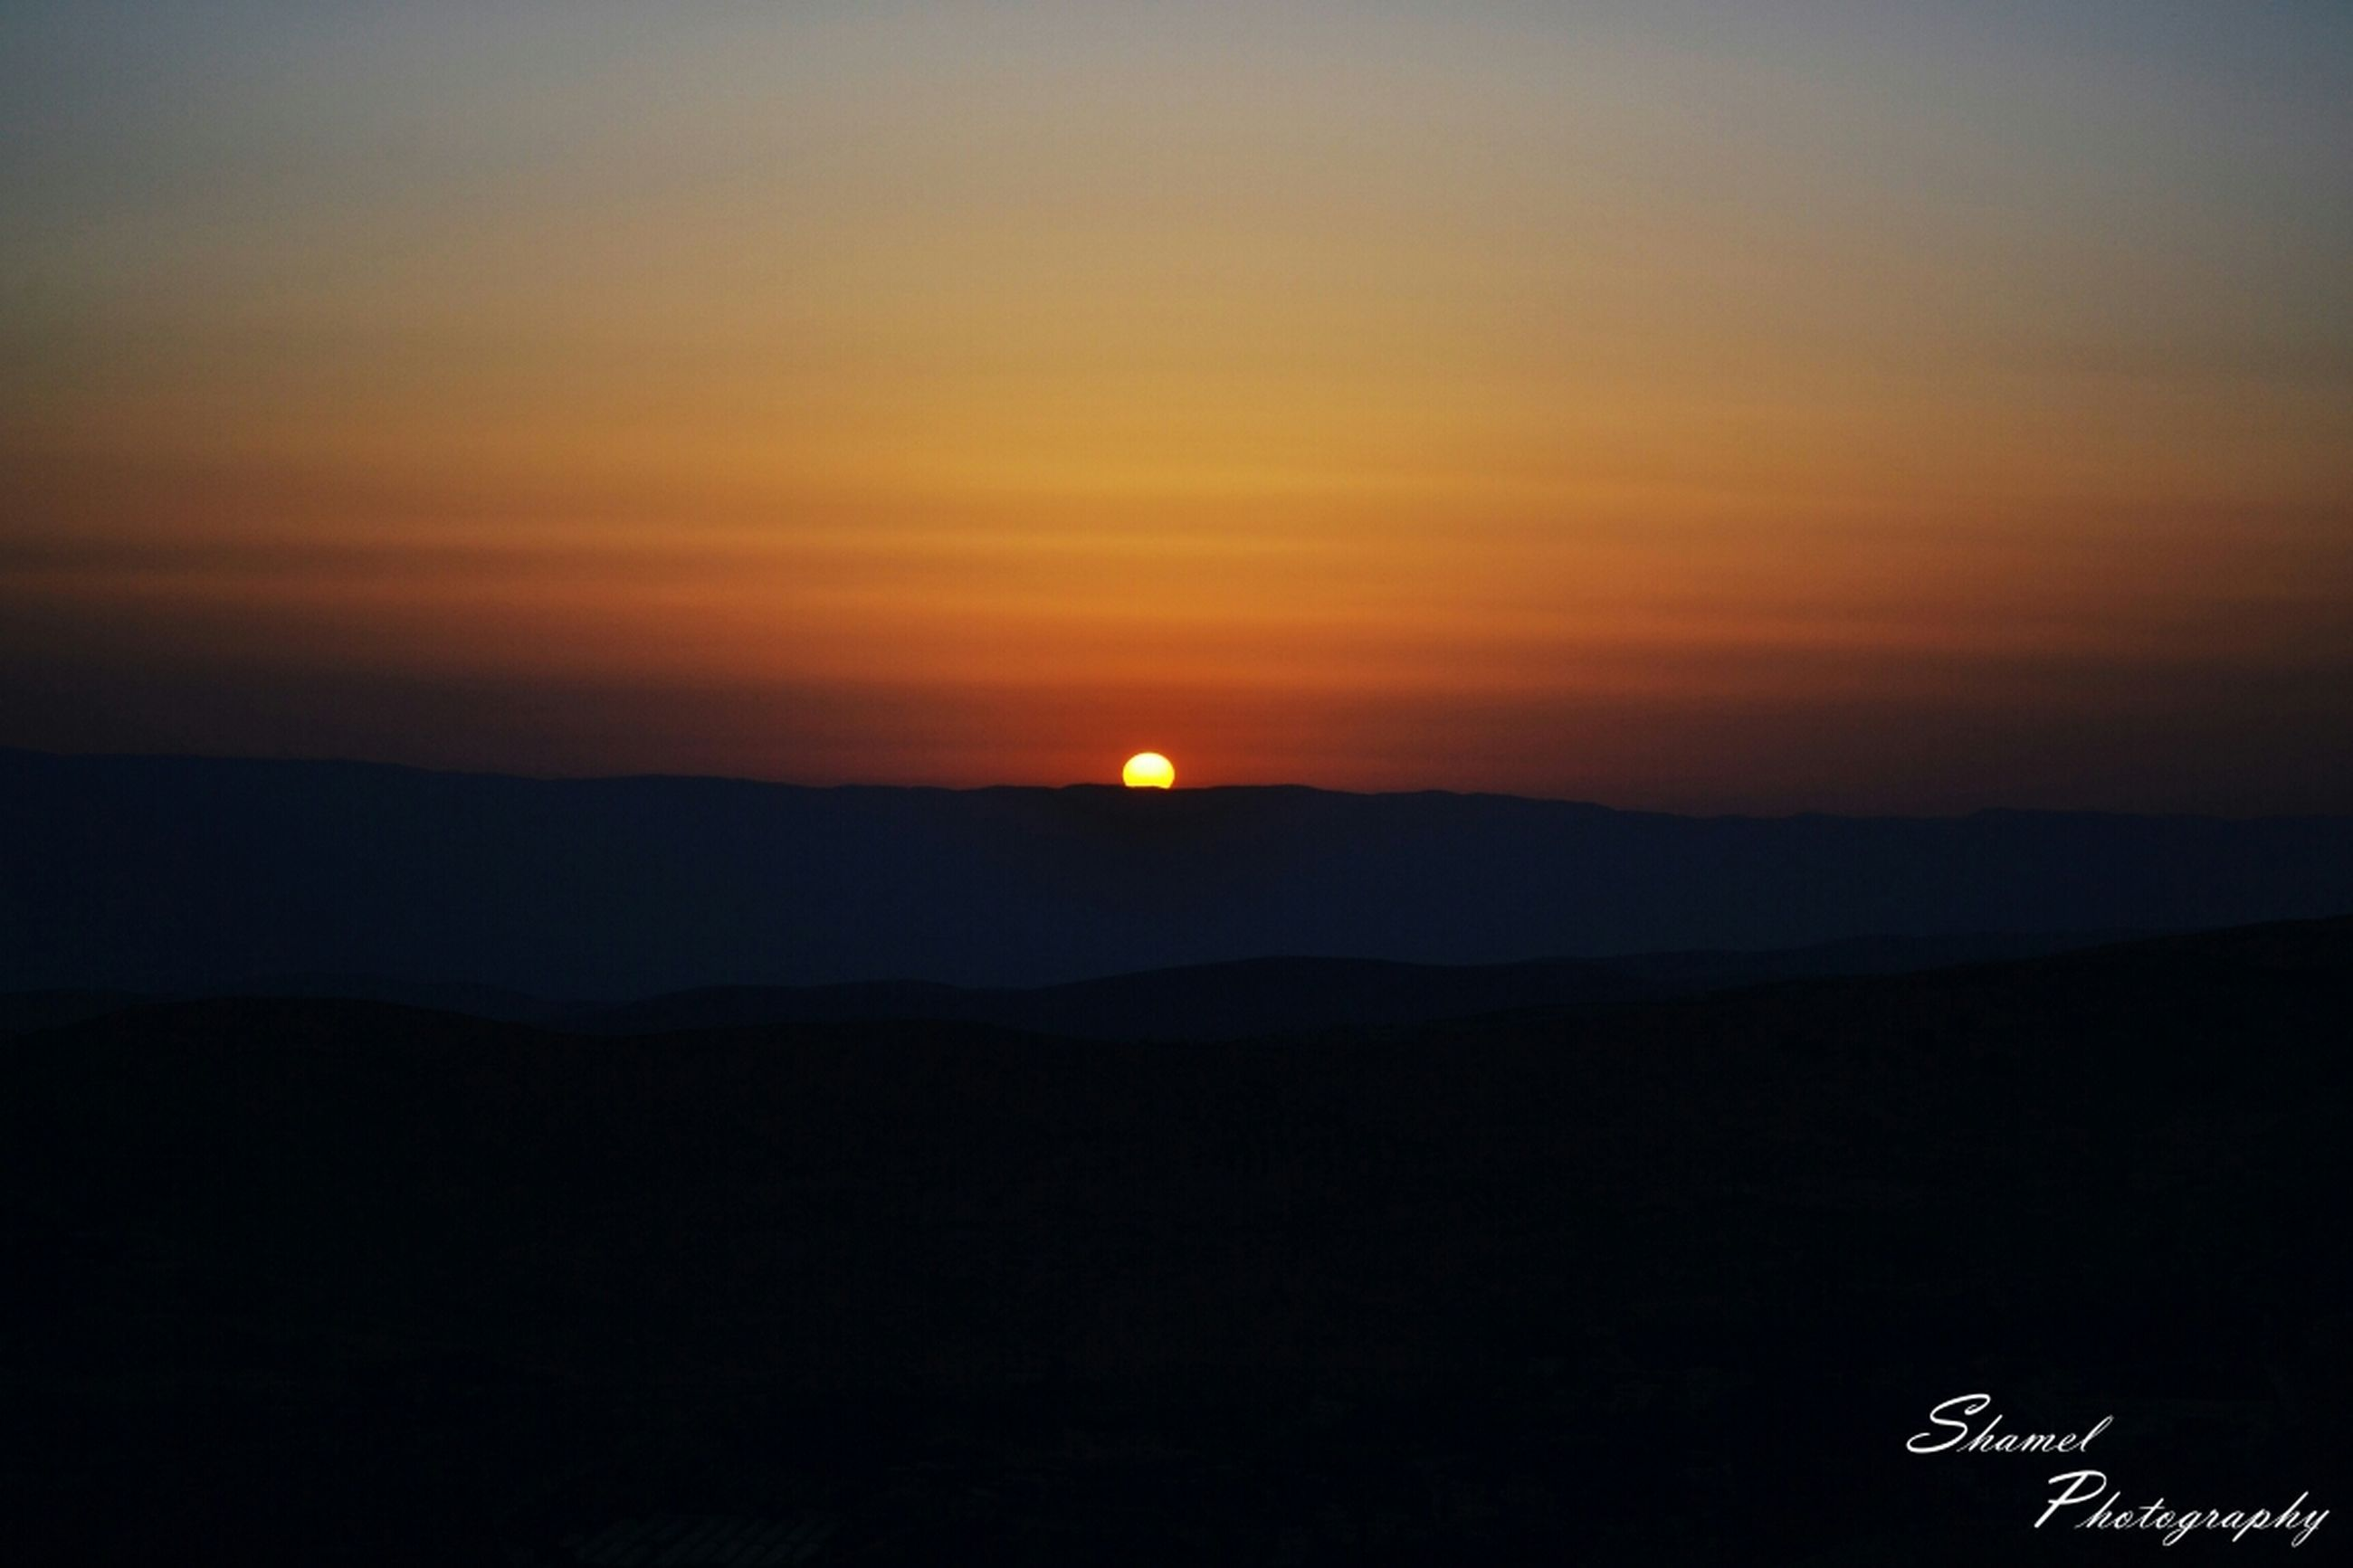 sunset, scenics, tranquil scene, silhouette, tranquility, beauty in nature, mountain, sun, idyllic, orange color, landscape, nature, sky, mountain range, copy space, dark, dusk, non-urban scene, outdoors, majestic